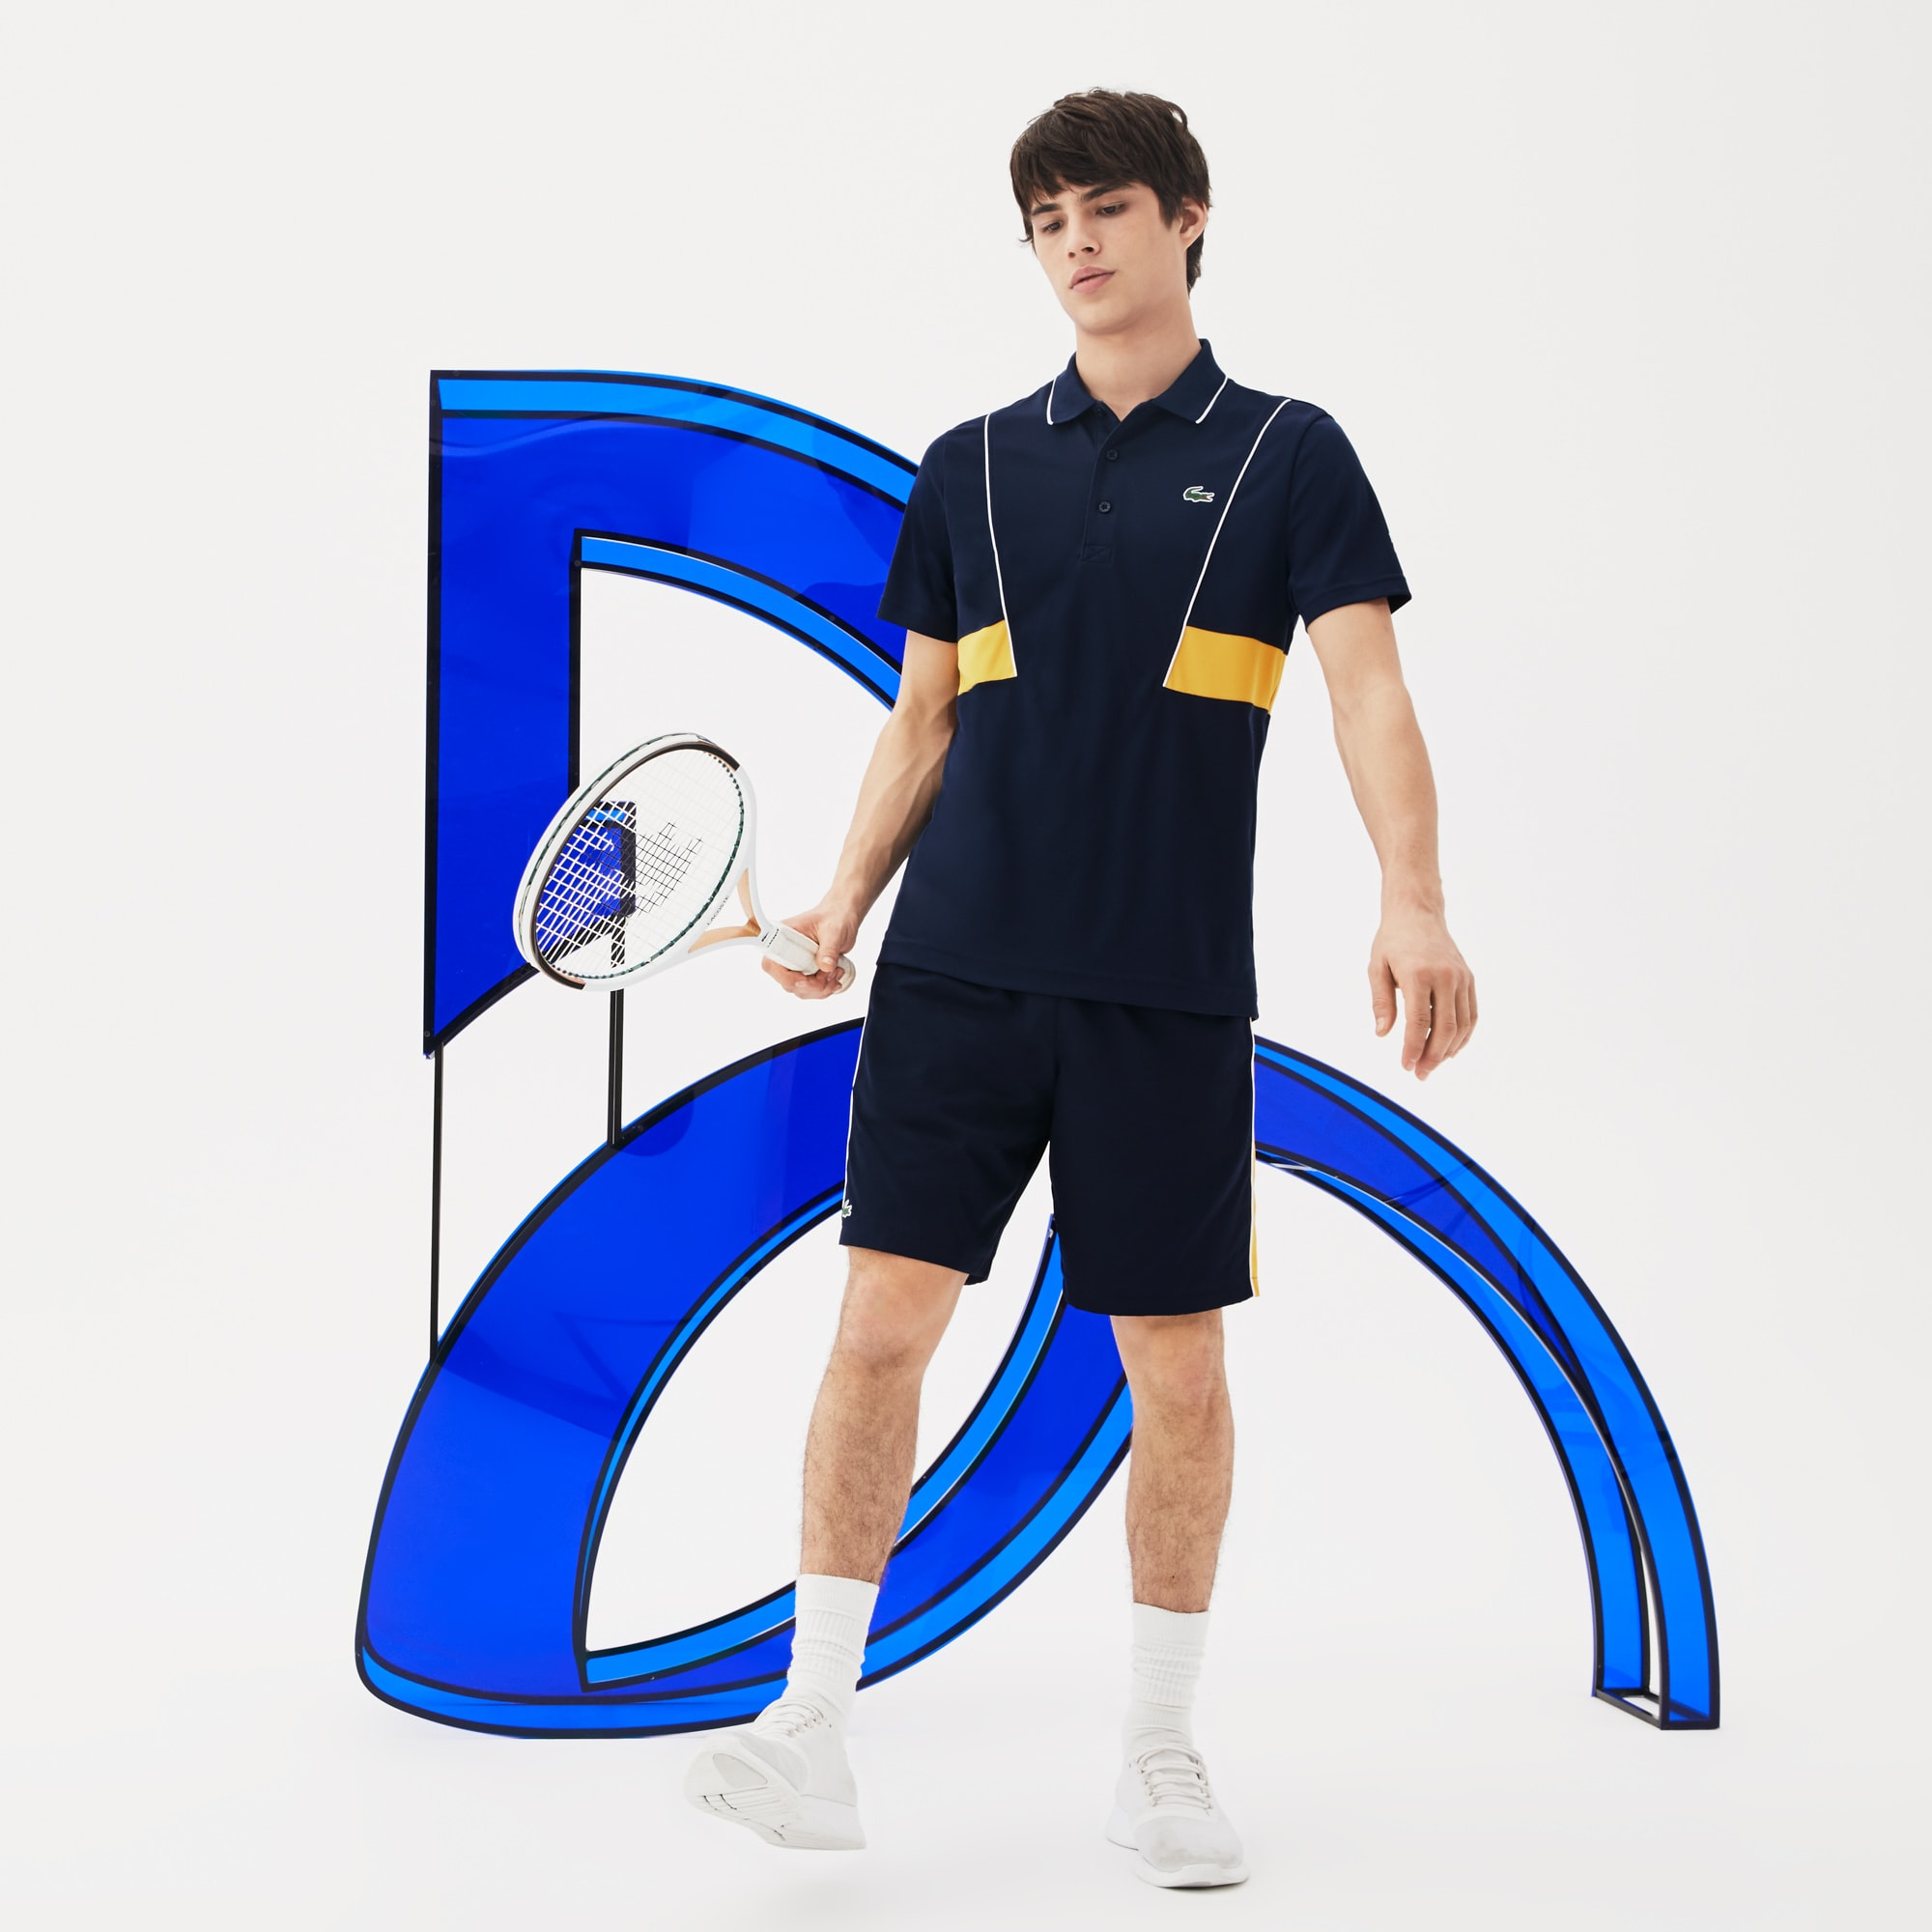 Men's SPORT Colorblock Shorts - Novak Djokovic Collection